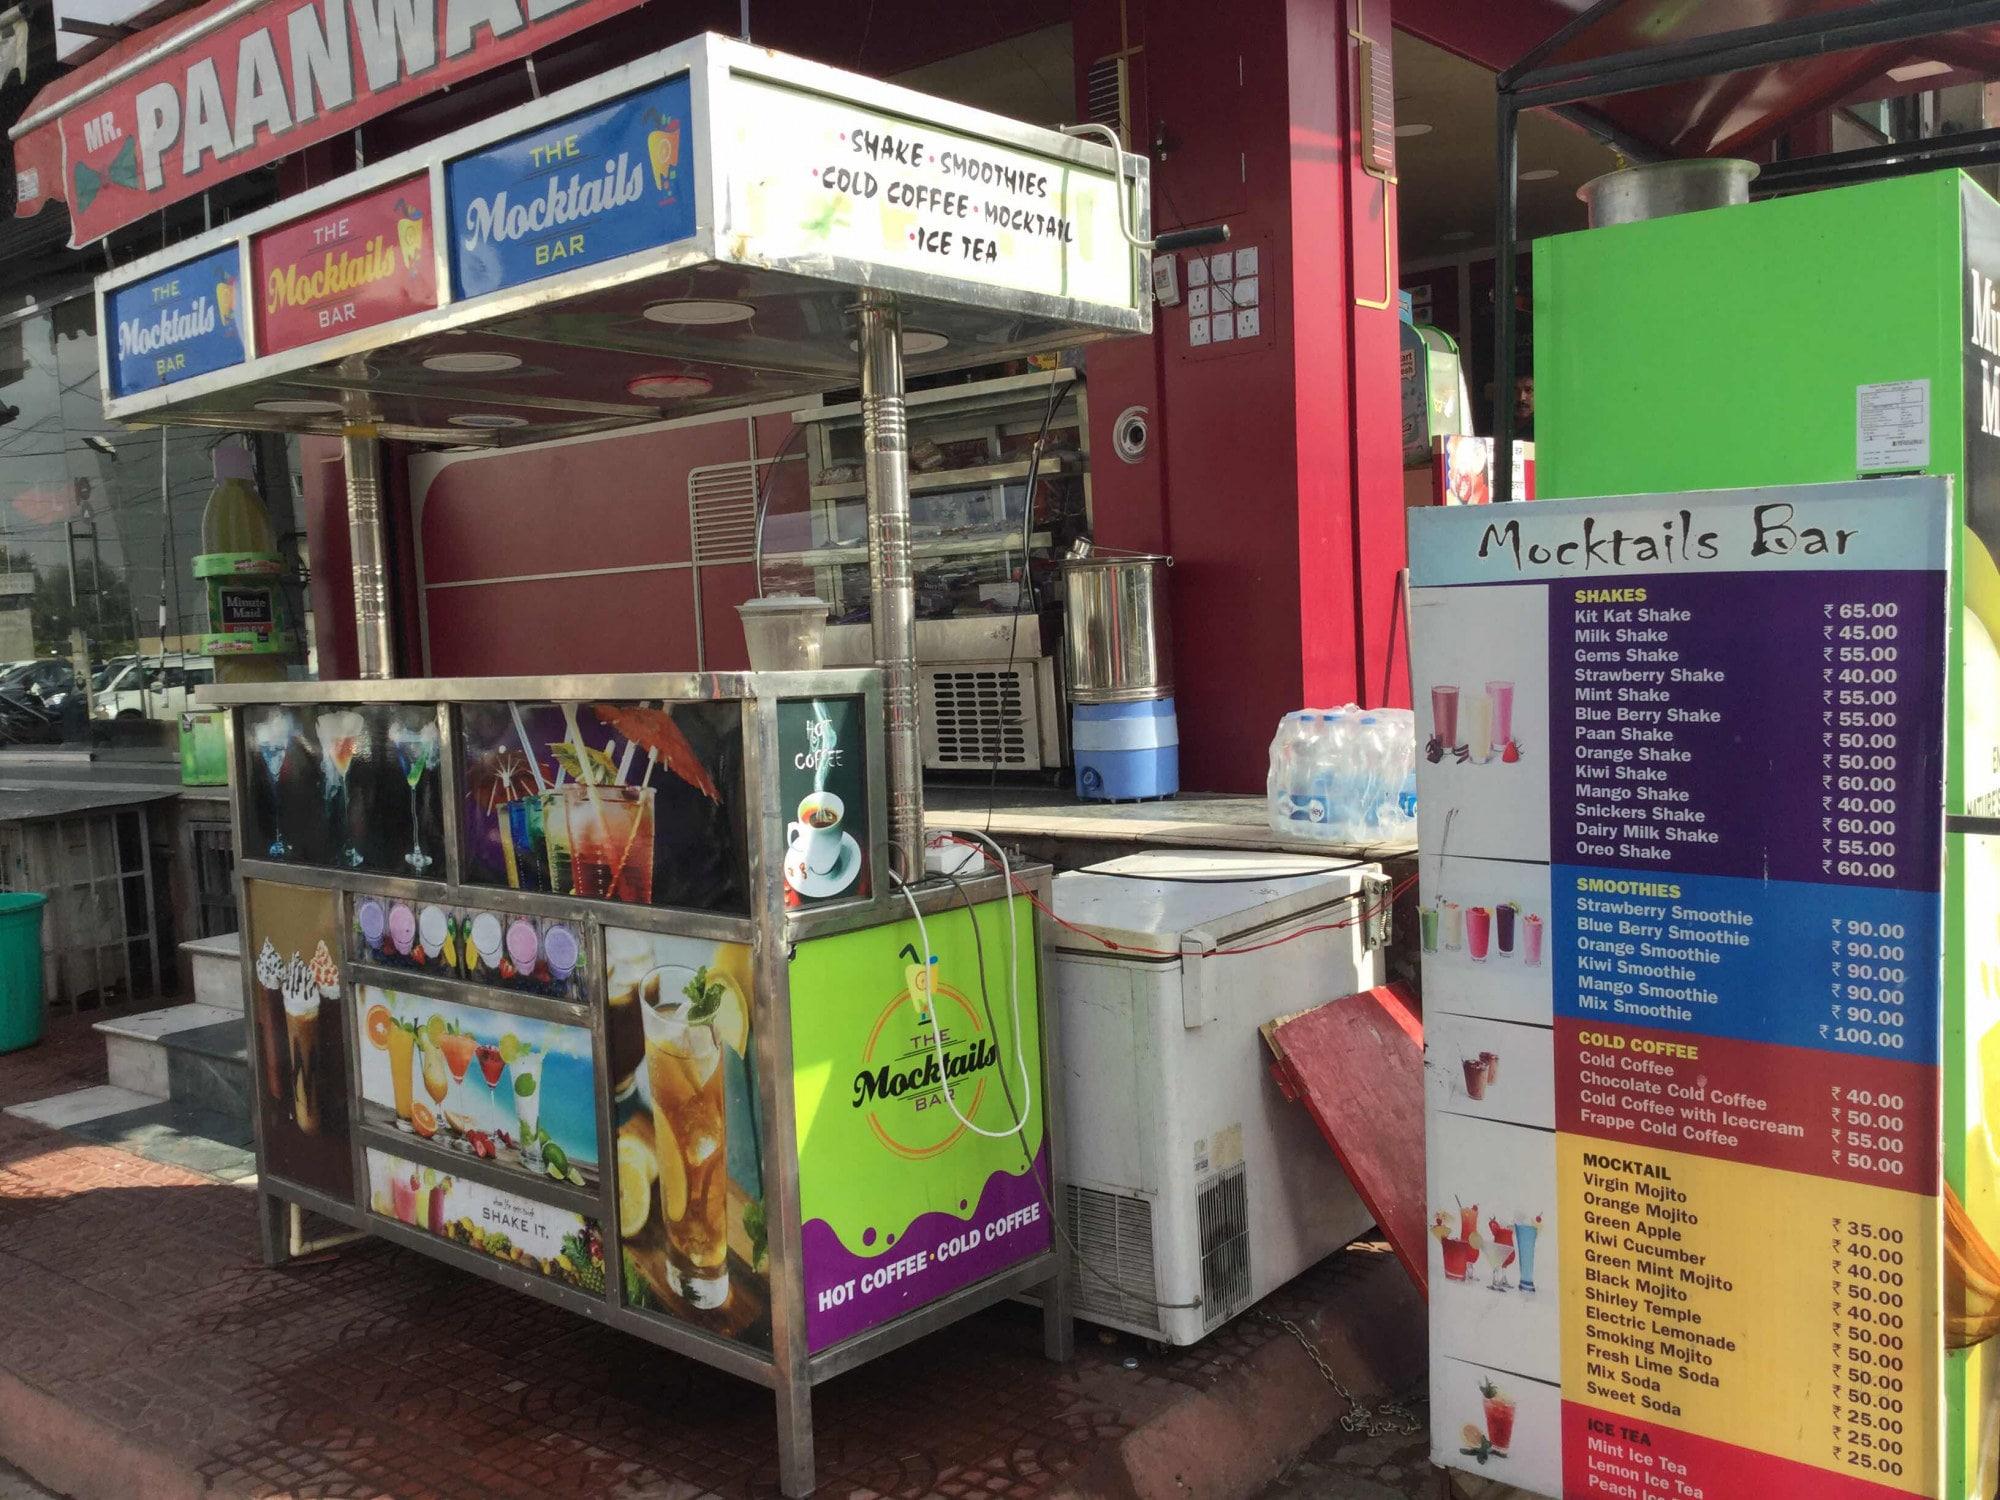 Top 30 Marlboro Cigarette Retailers in Jaipur - Best